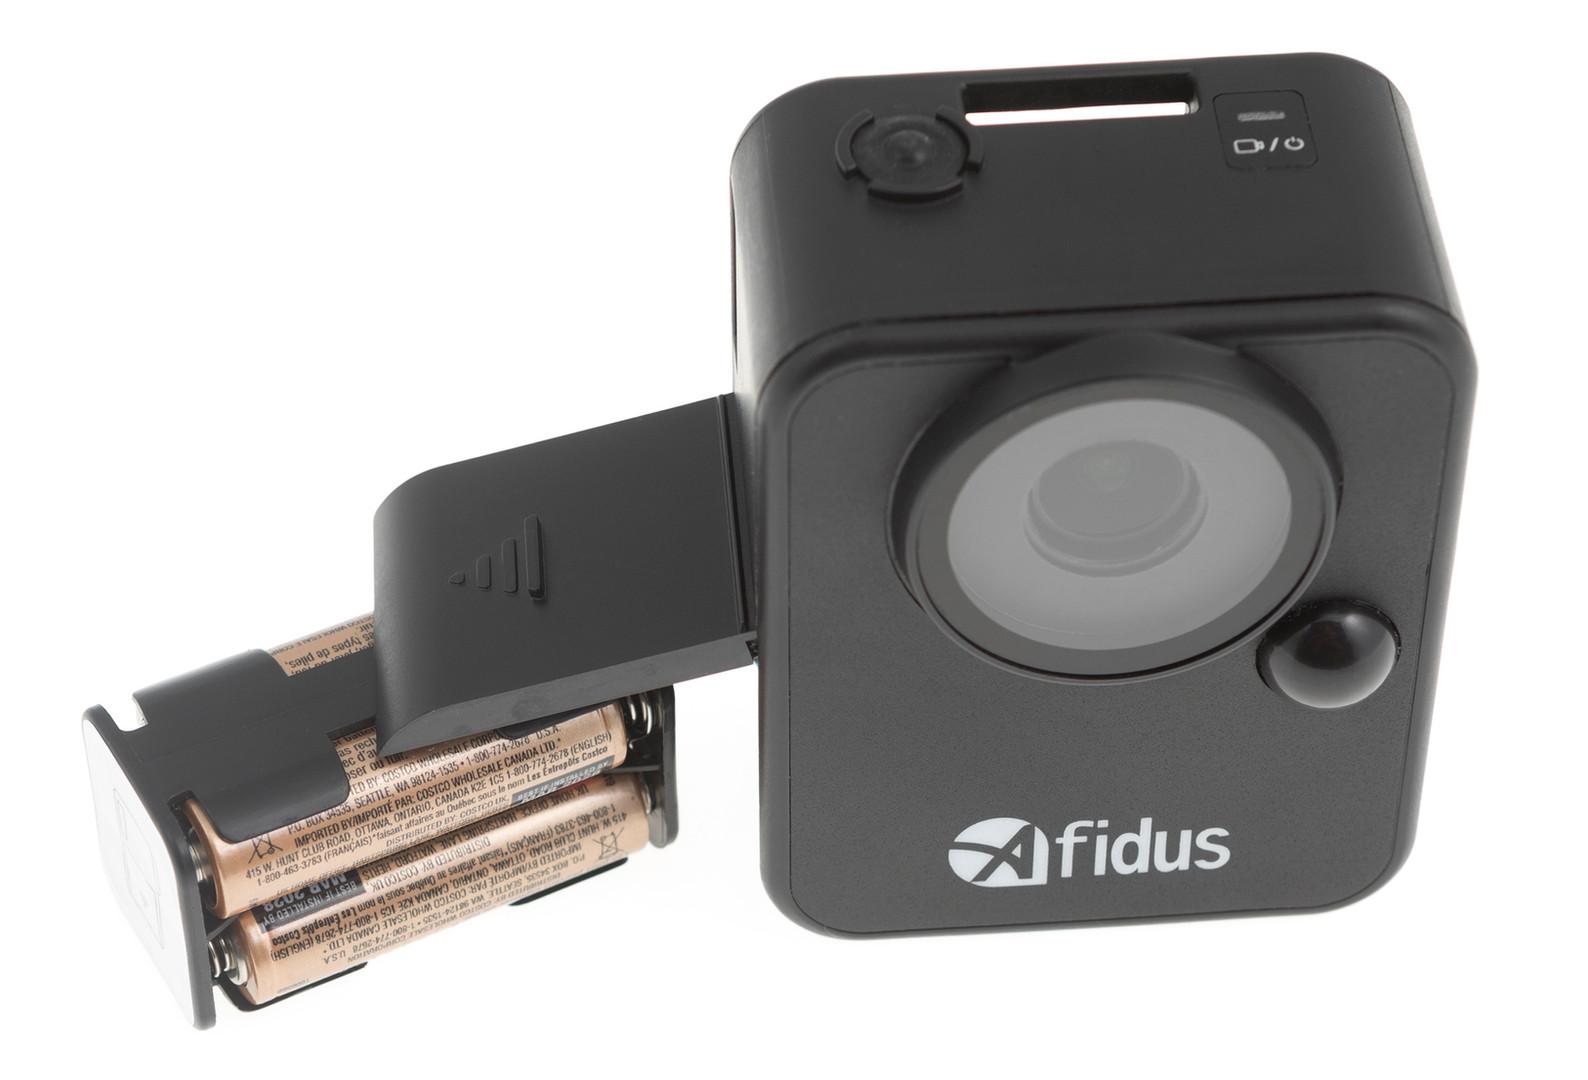 Afidus Timelapse Camera Battery Door.jpg